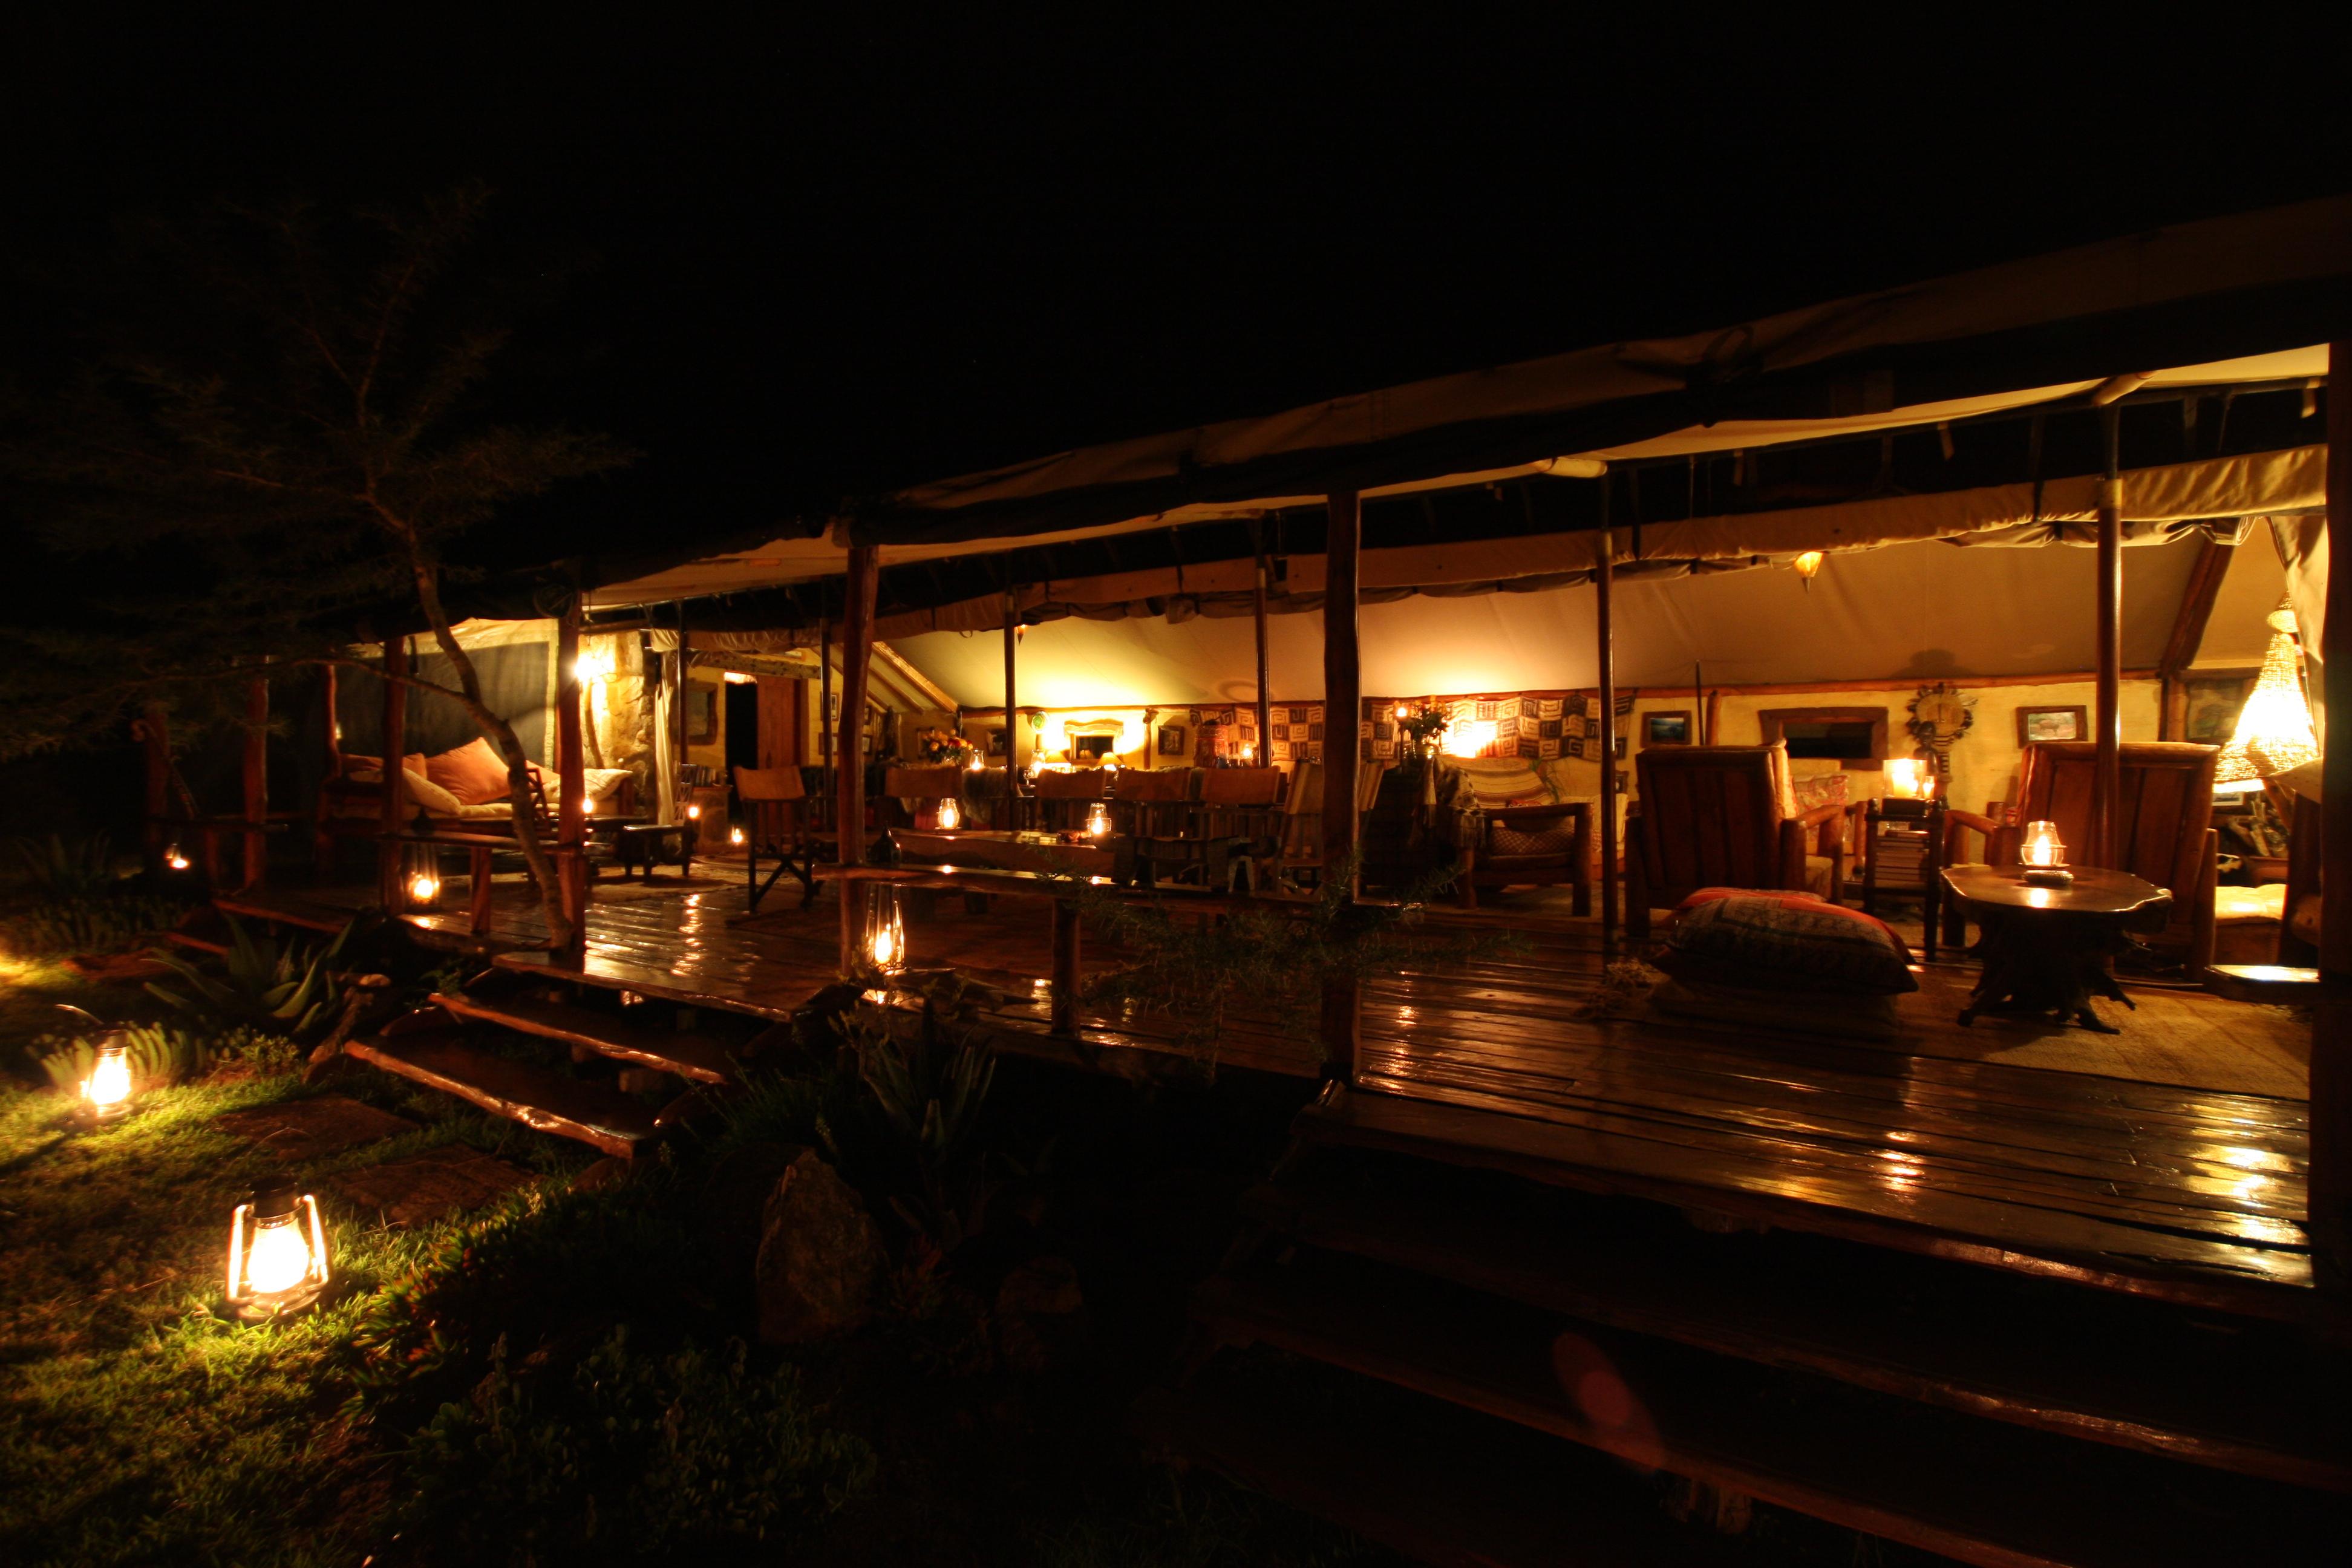 Enasoit Kenya Camp Evening Exterior